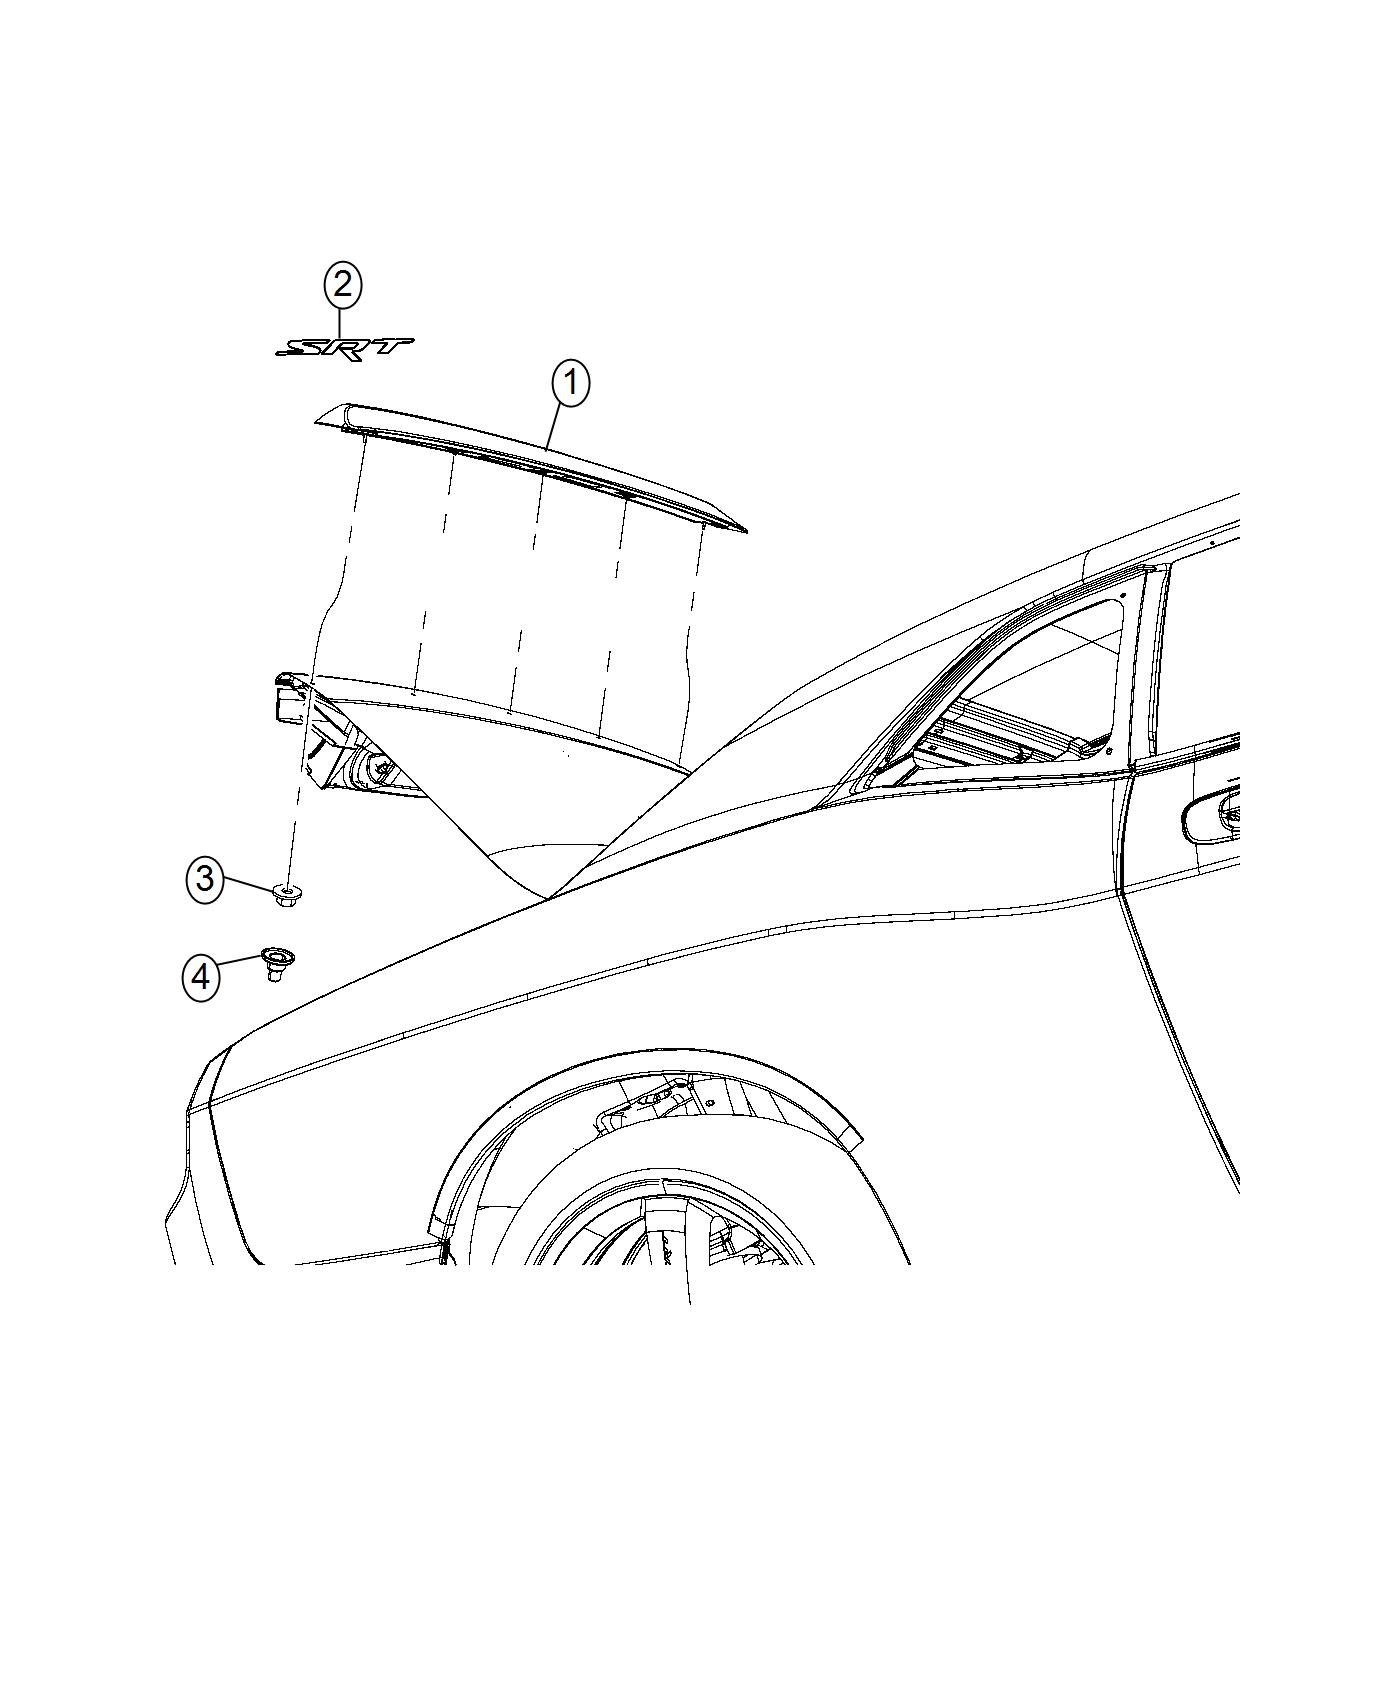 2016 Dodge Challenger SXT 3.6L V6 A/T Spoiler. Rear. [rear